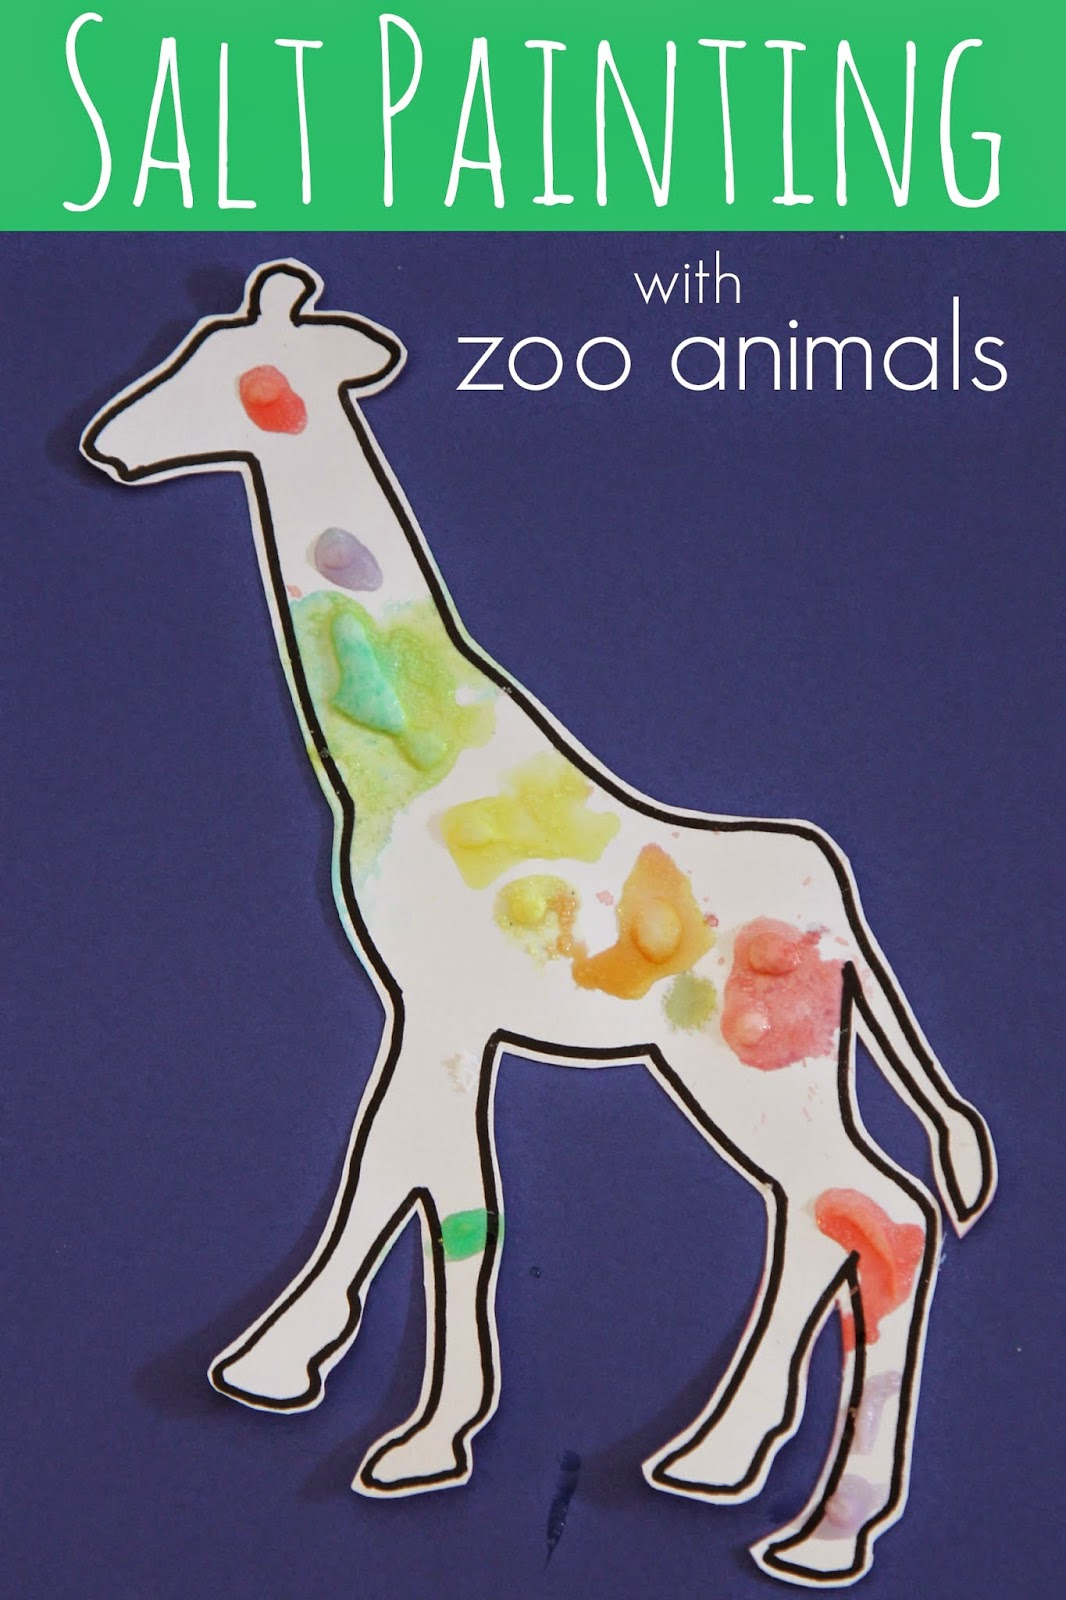 Zoo Animal Salt Painting For Kids